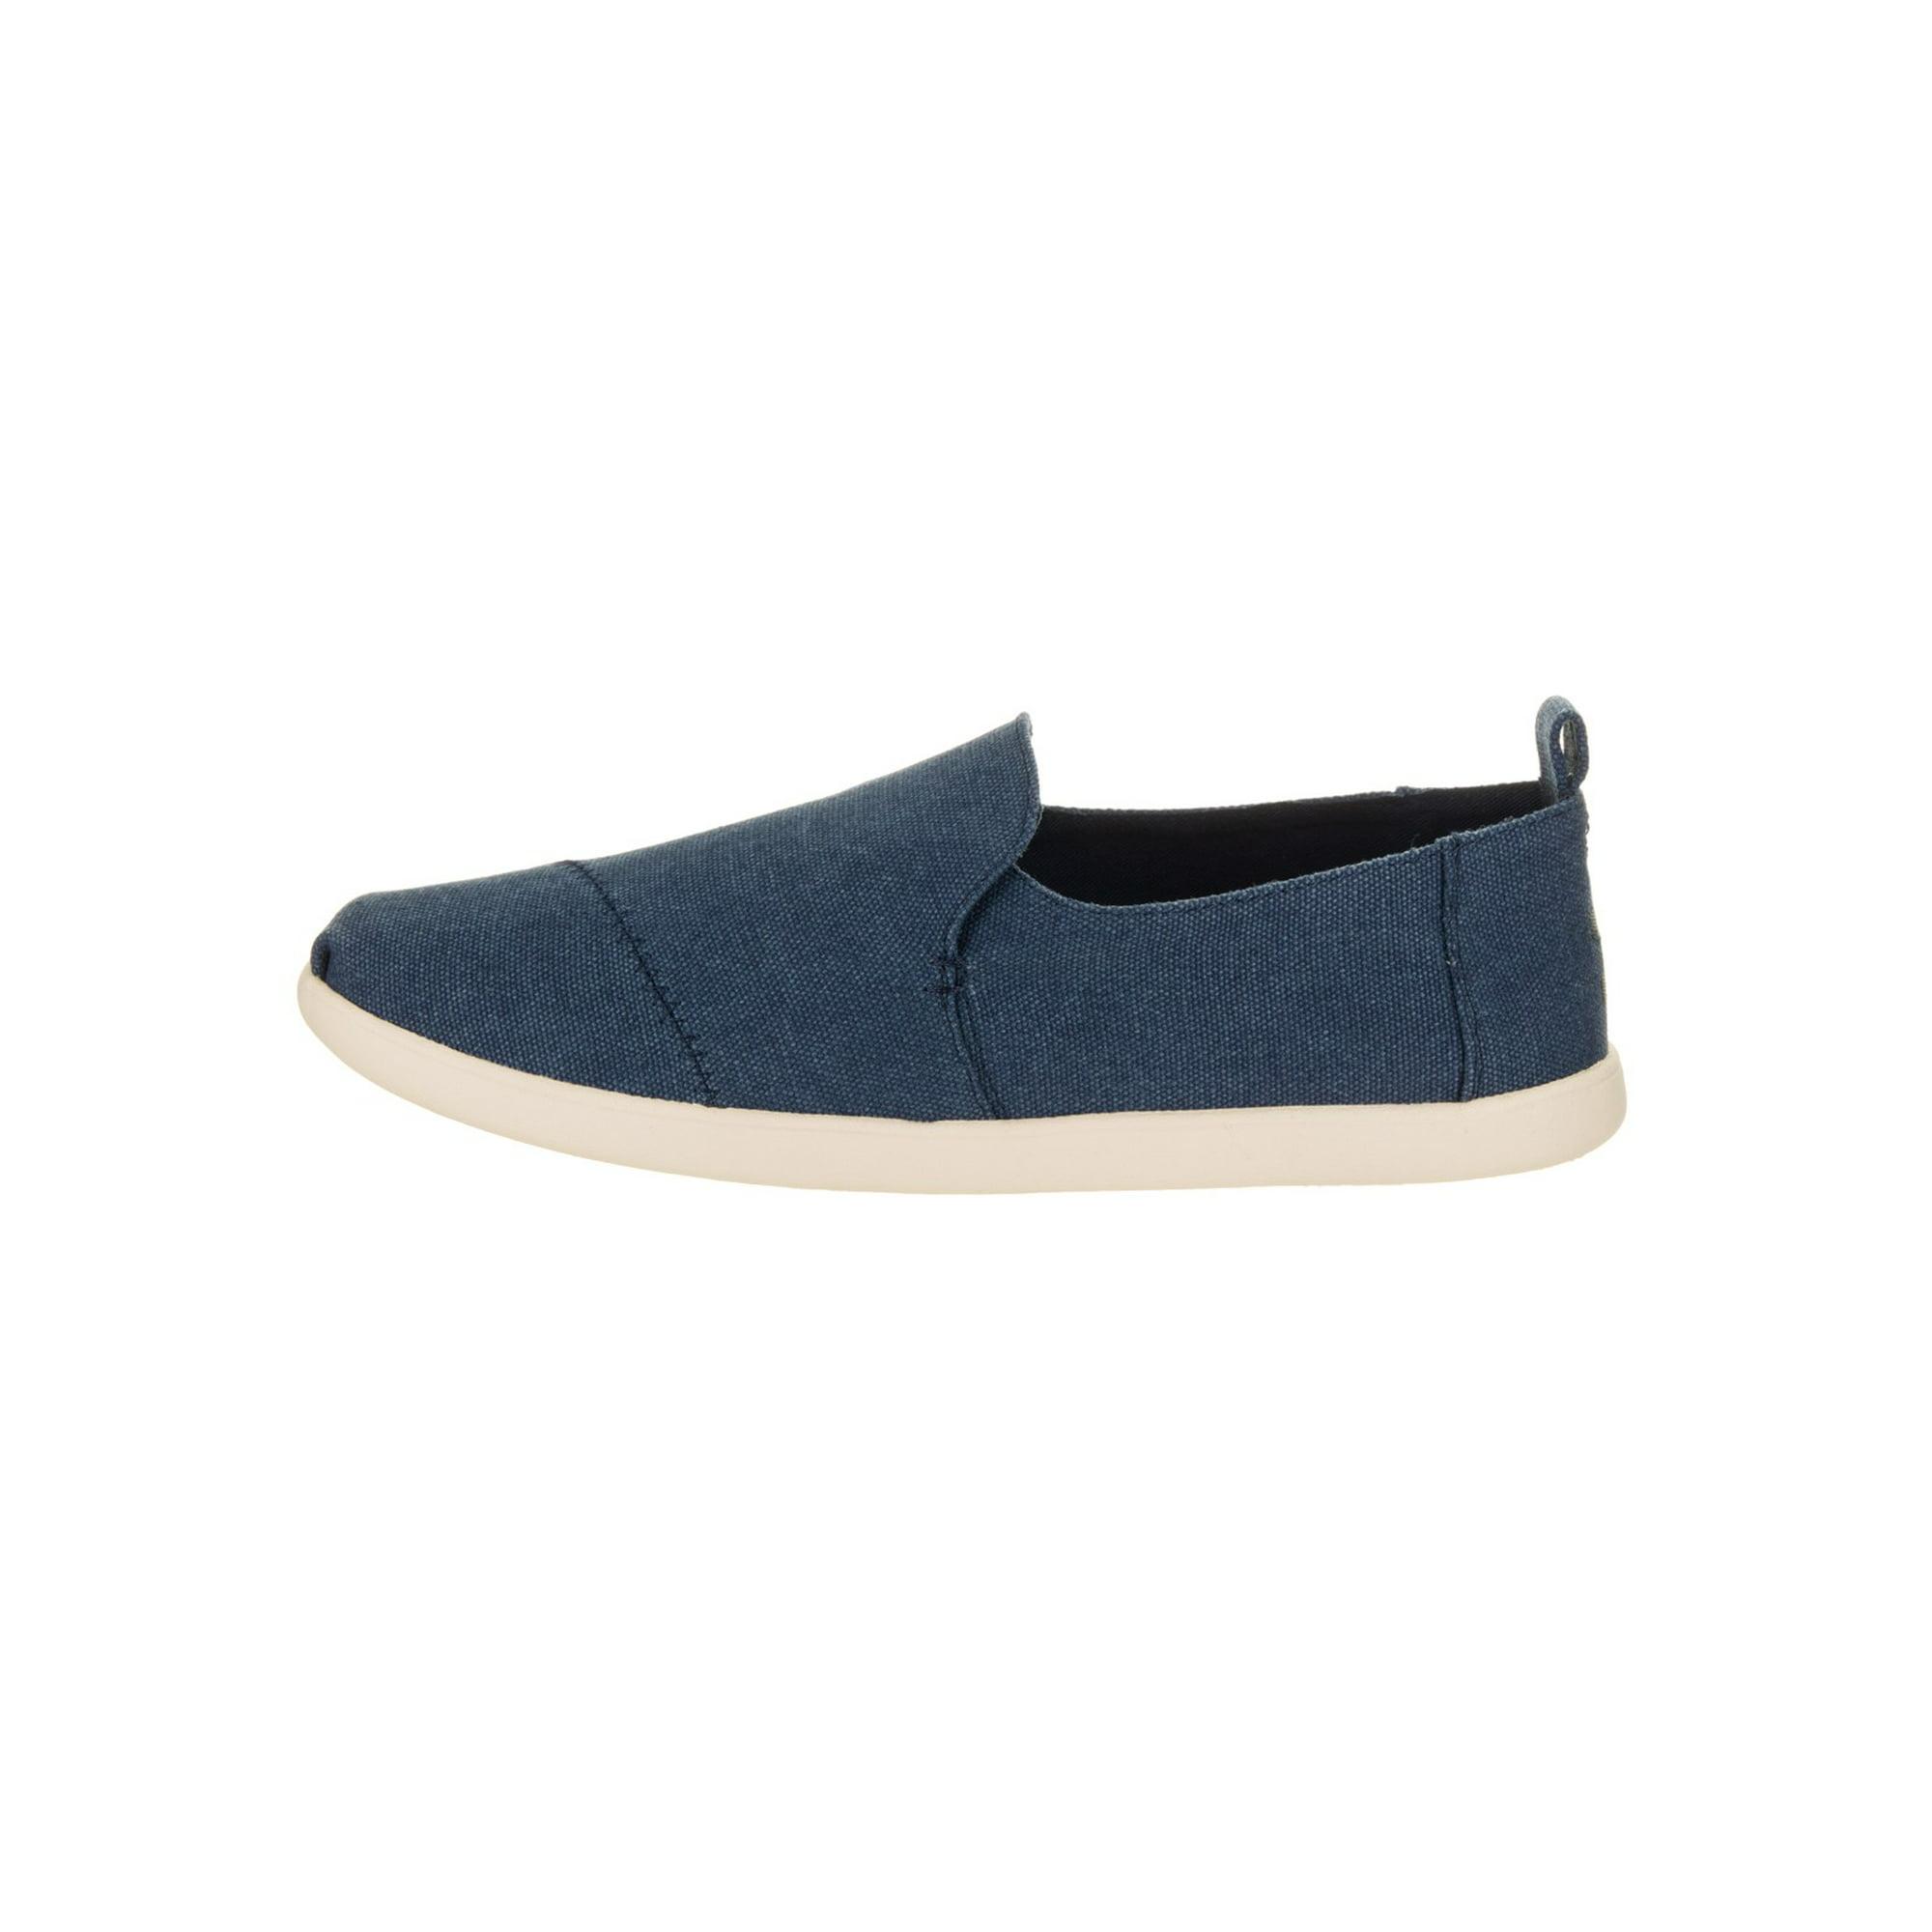 a88d318251f Toms Men s Deconstructed Alpargata Casual Shoe